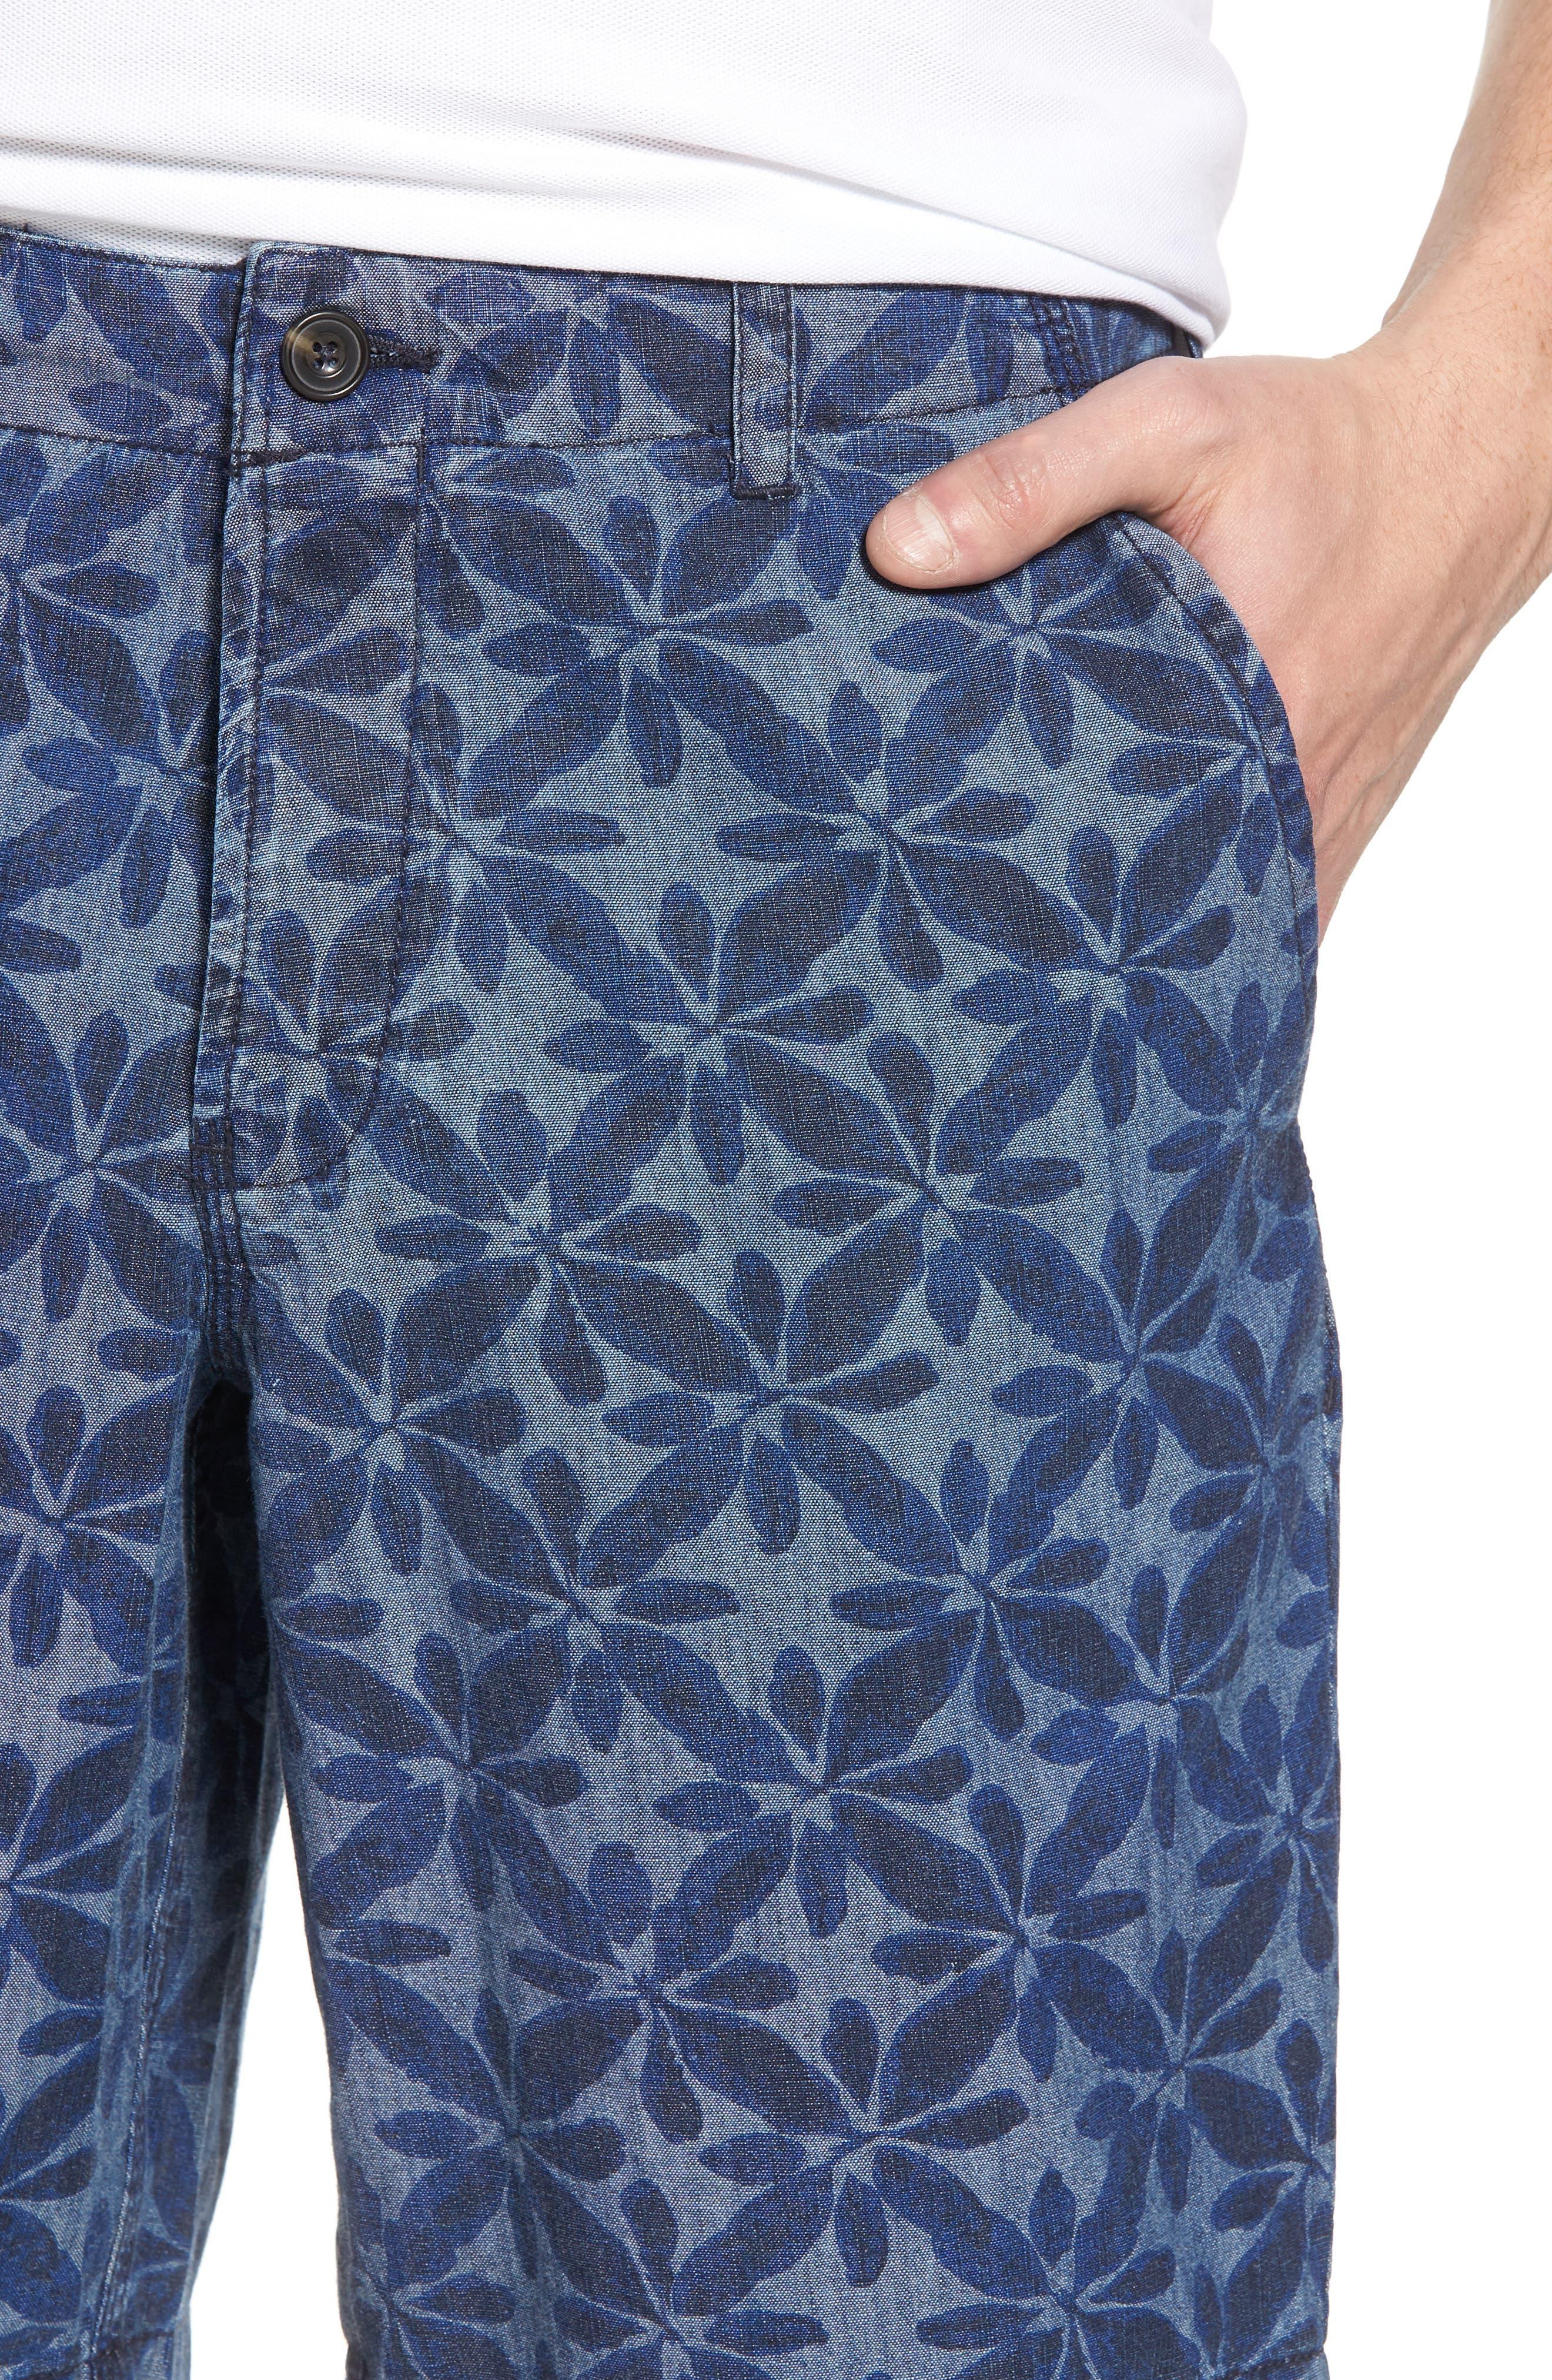 Franju Floral Cotton Shorts,                             Alternate thumbnail 4, color,                             Rinse And Softener